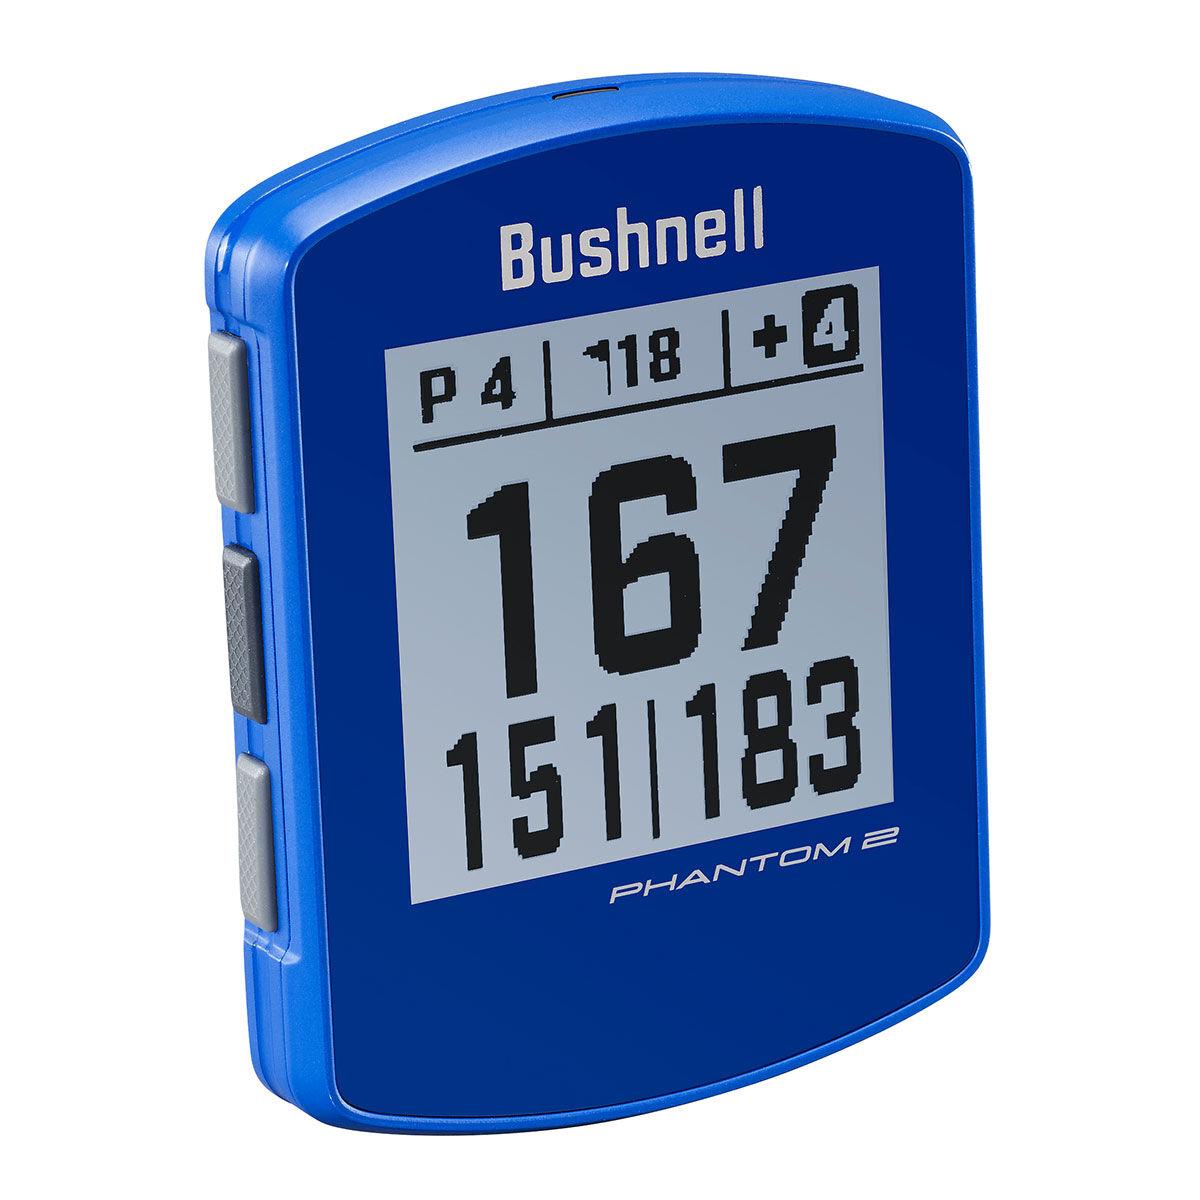 Bushnell Phantom 2 Handheld Golf GPS, Mens, Blue, One Size | American Golf